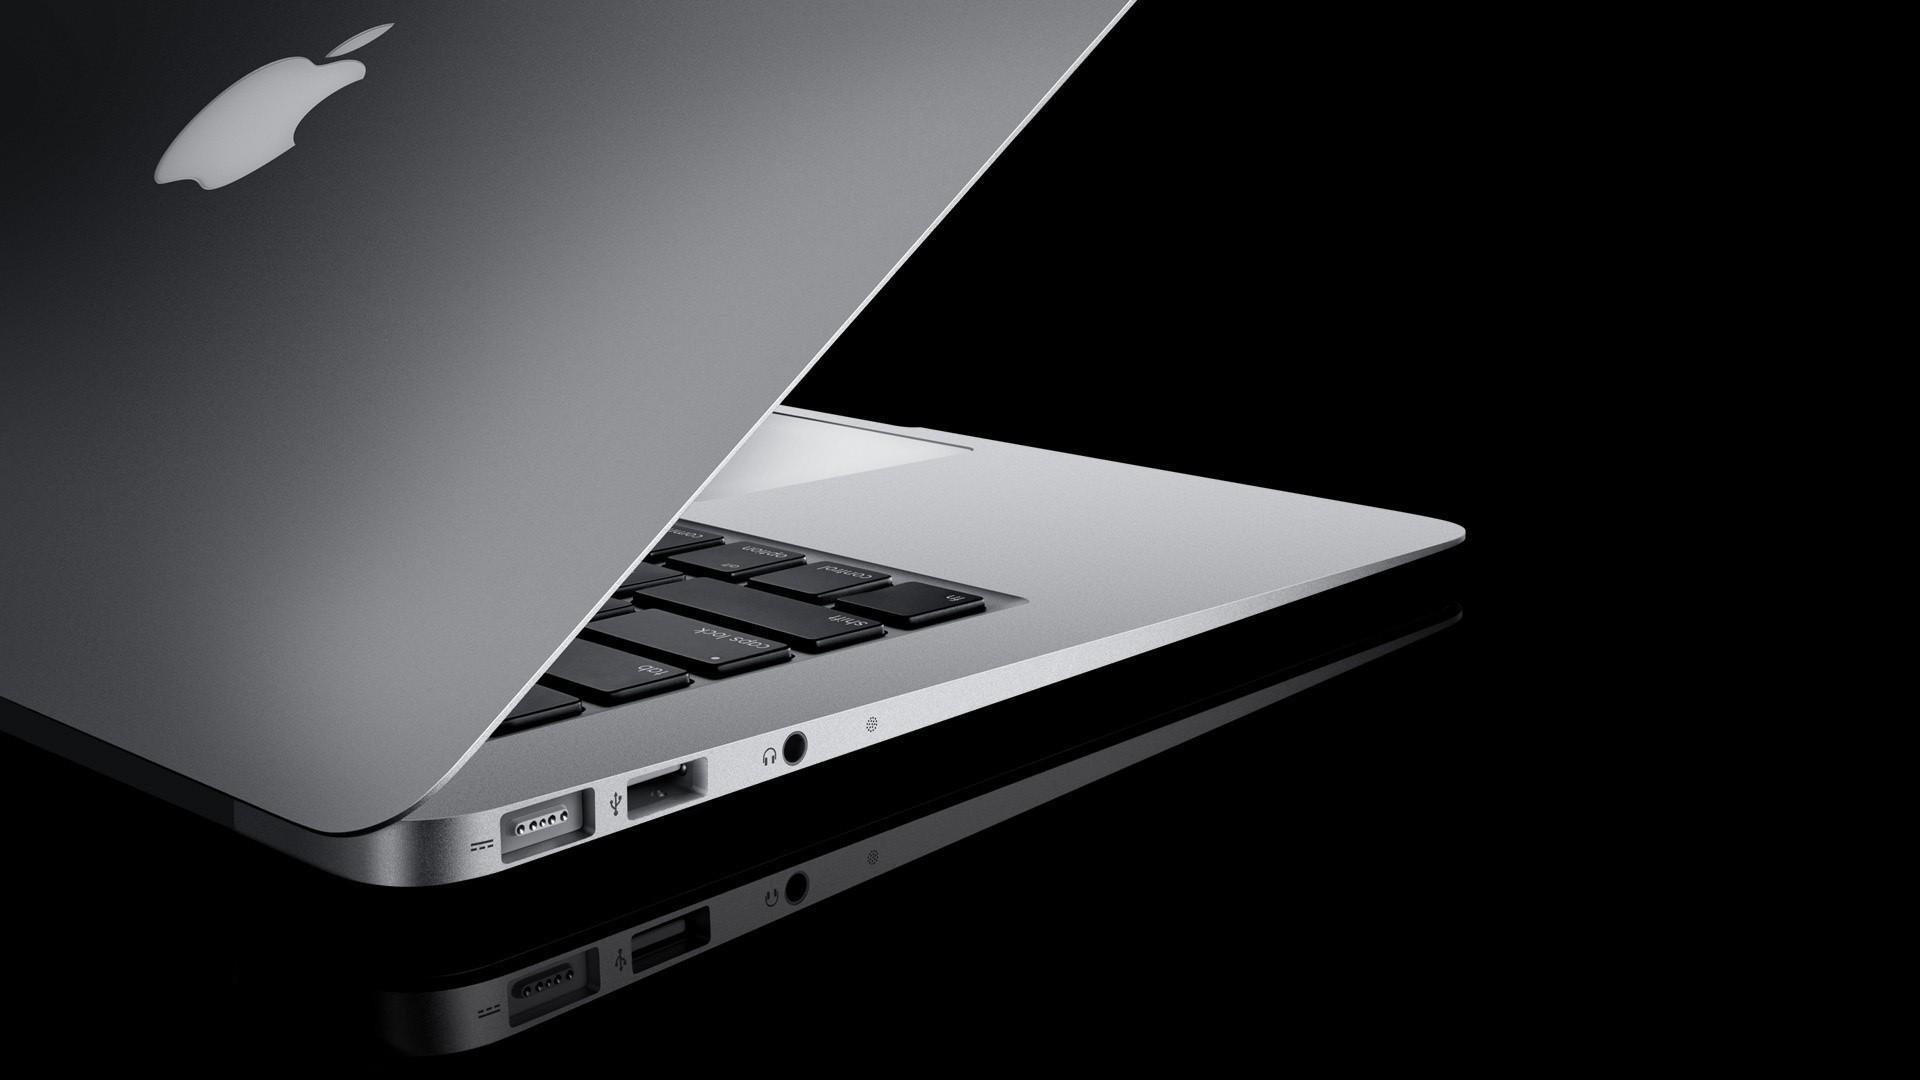 Apple Laptop Wallpaper Hd wallpaper   988845 1920x1080